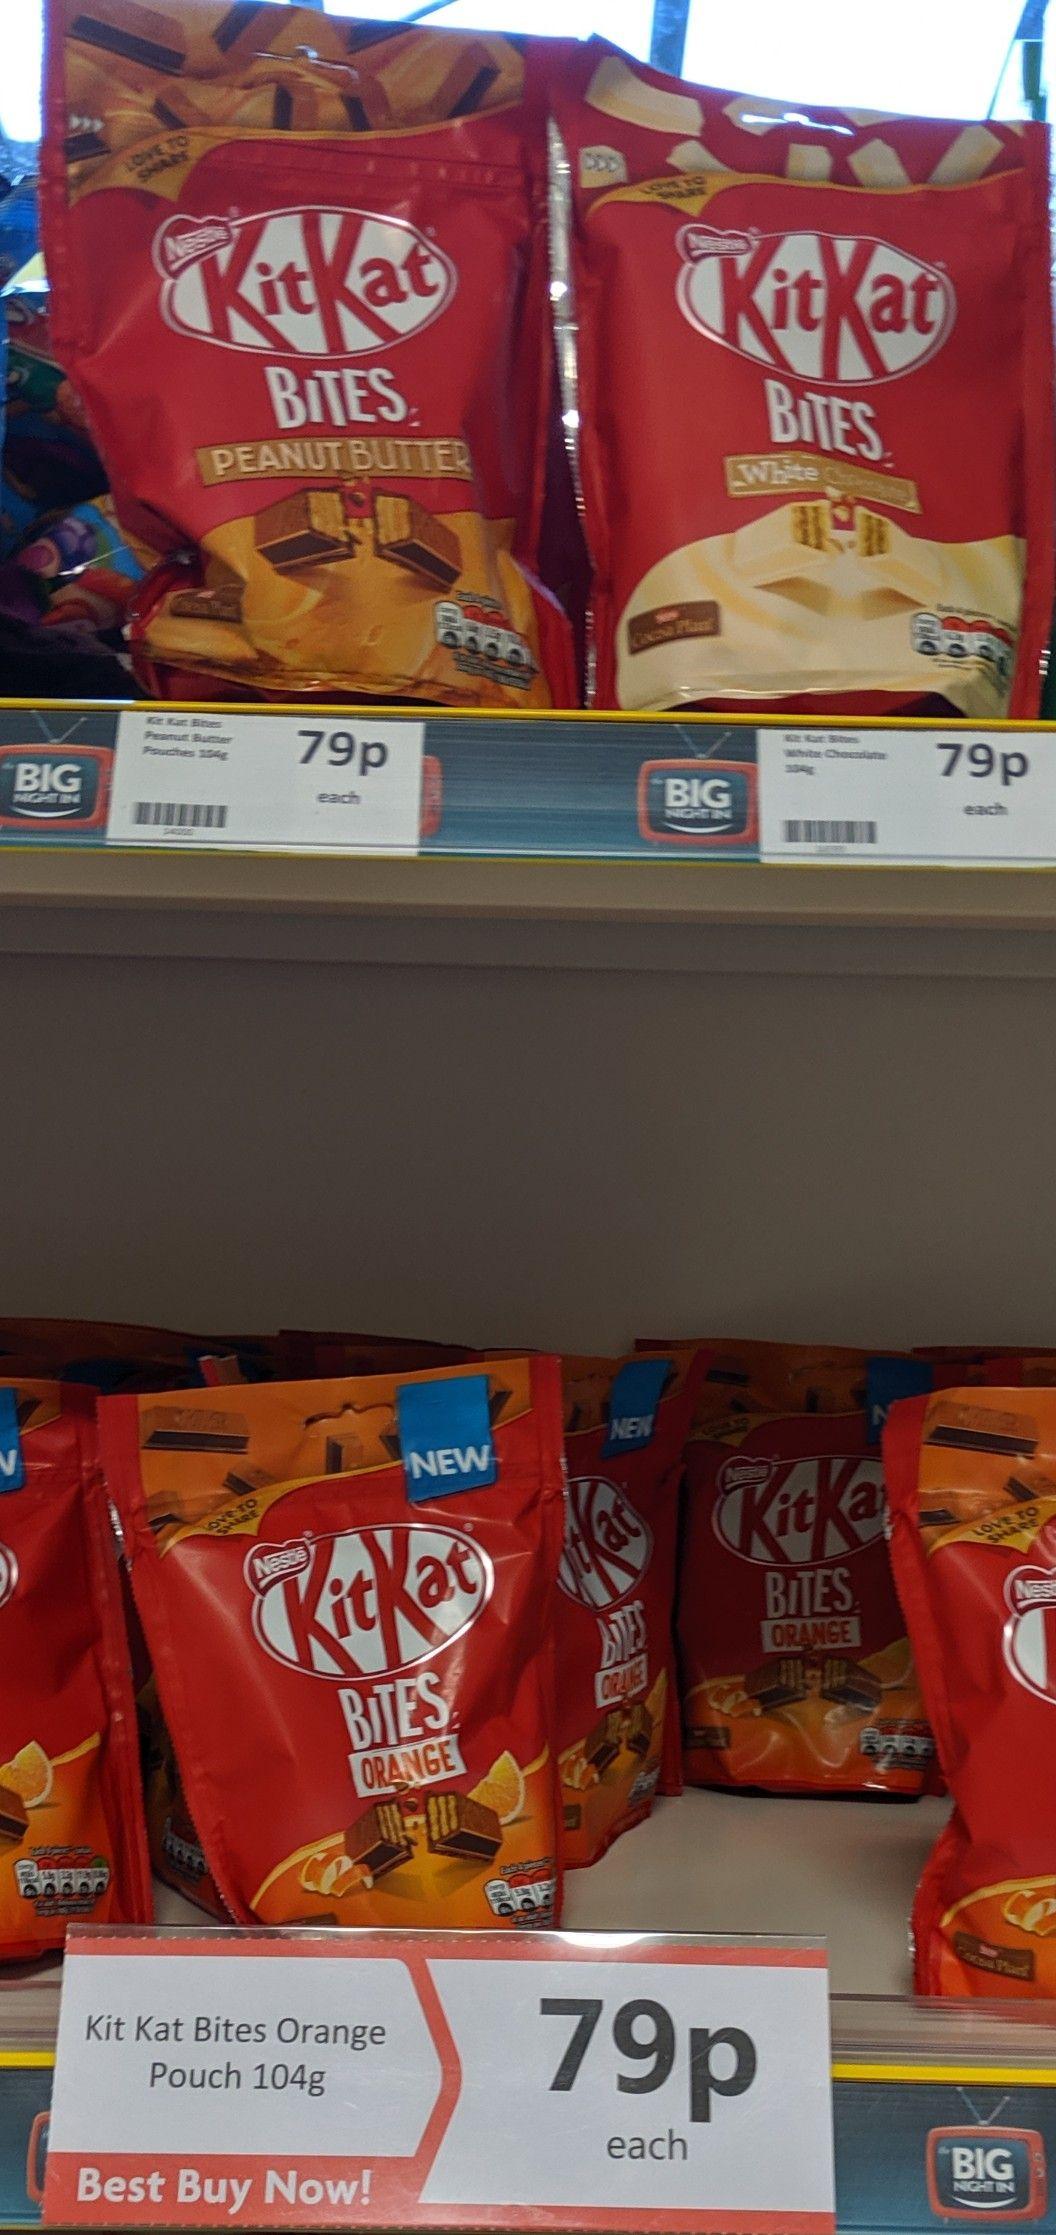 Kit Kat Bites Orange, Peanut Butter & White 104g bags 79p each @ Heron Foods Bury